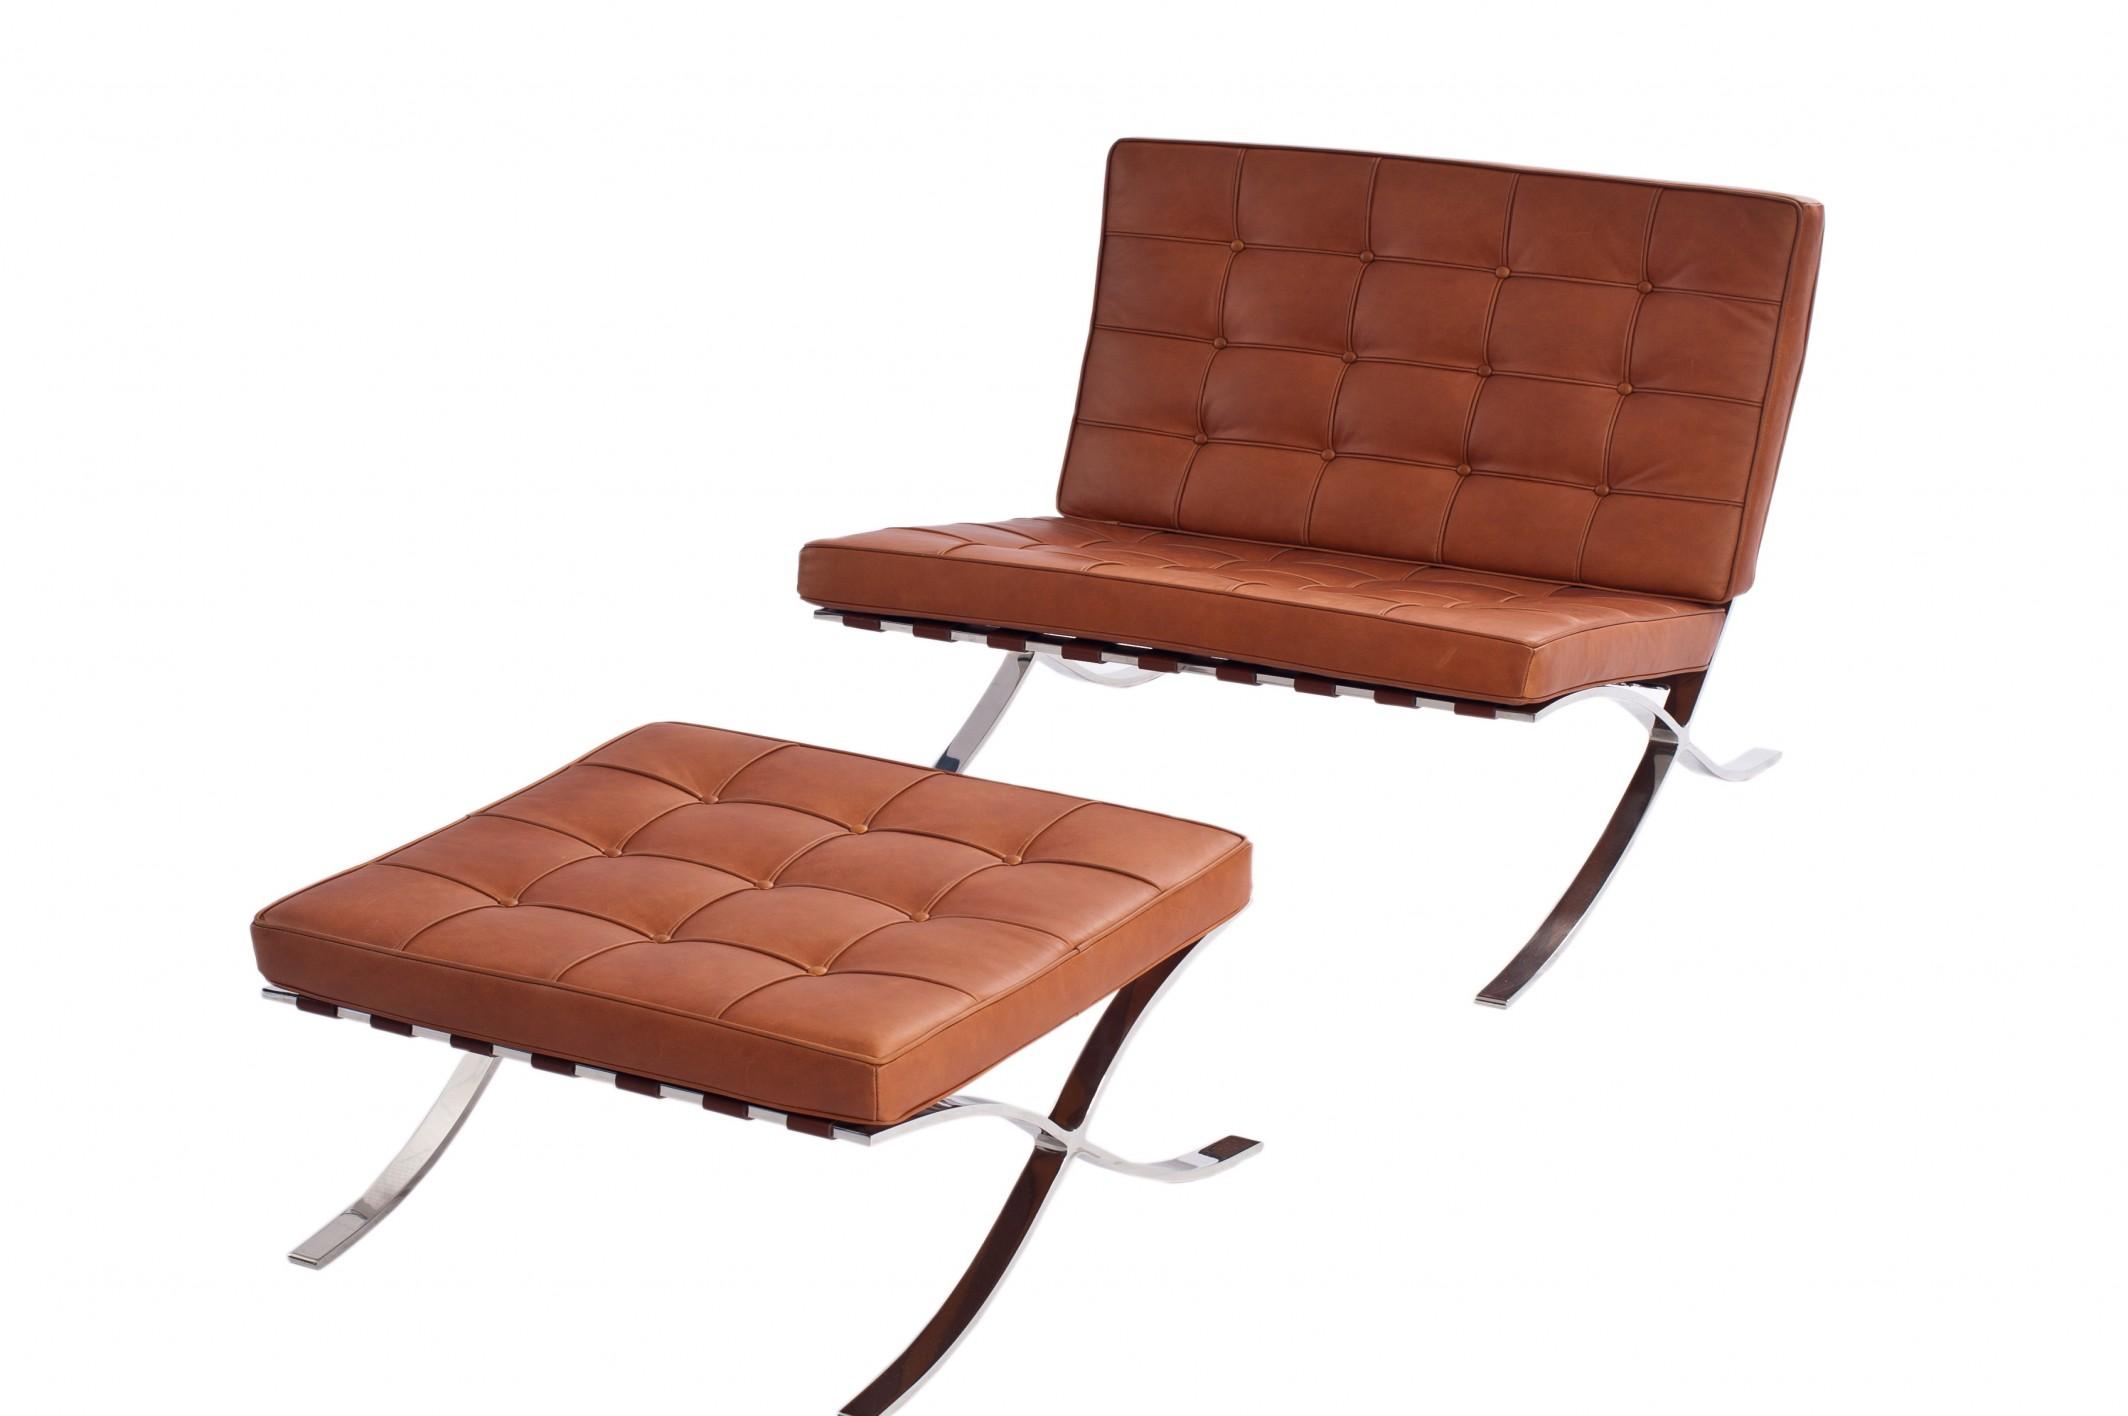 Barcelona Chair Dimensions  HomesFeed